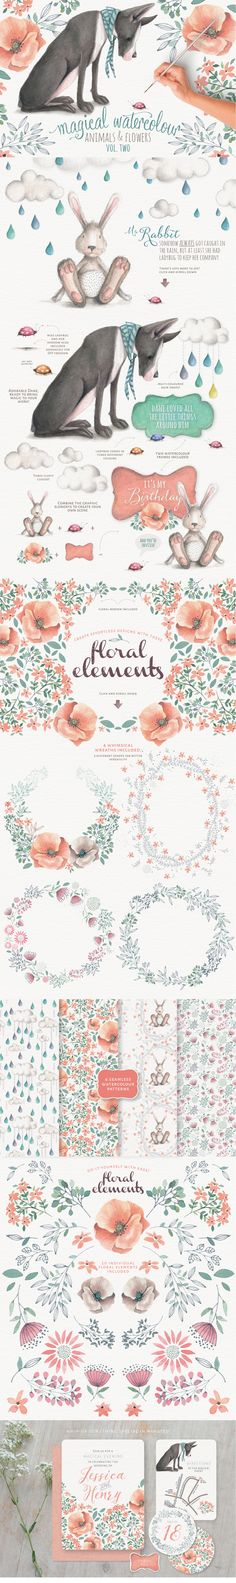 https://www.behance.net/gallery/27160423/Magical-watercolour-animals-flowers-vol-2